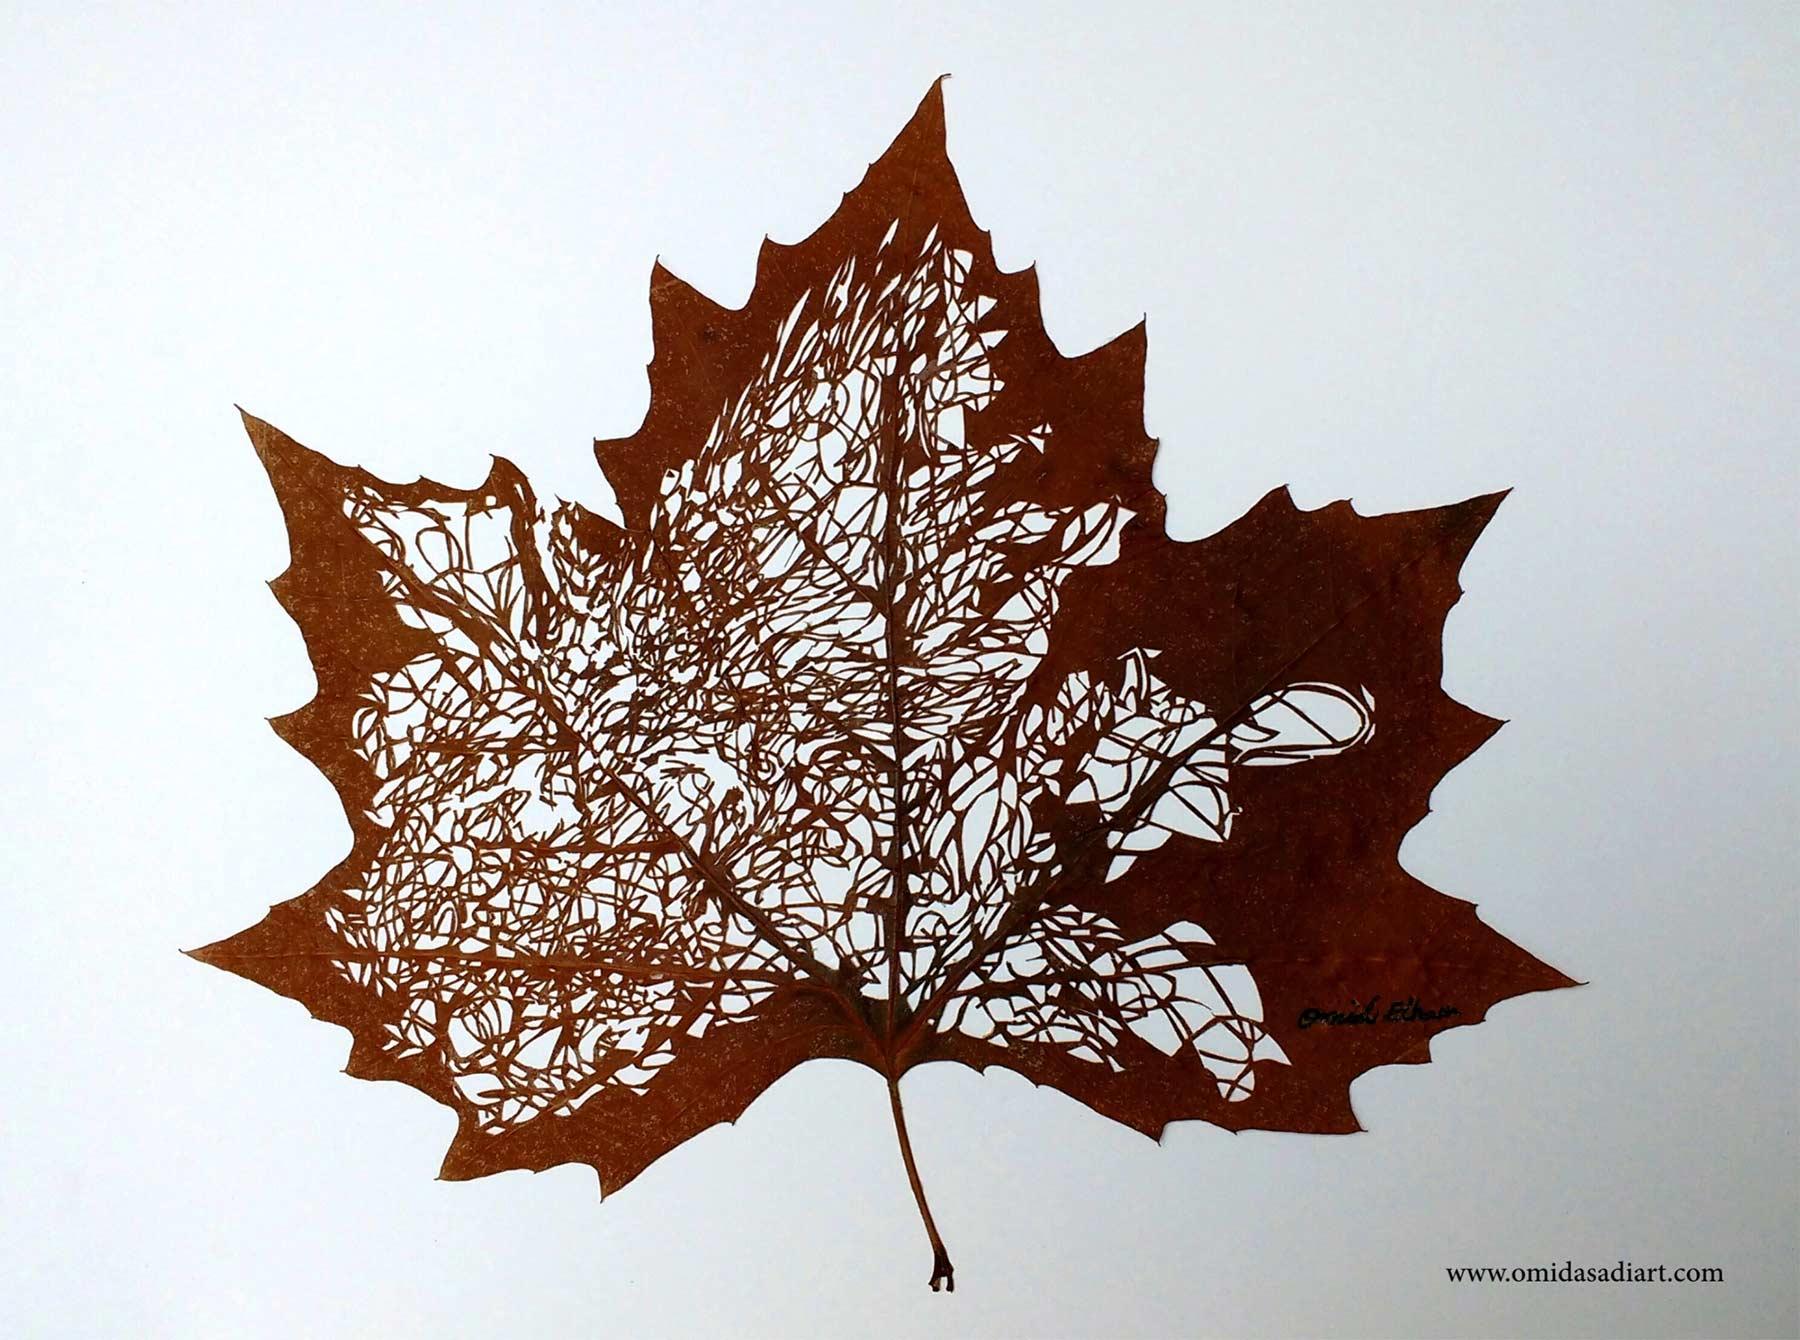 Kunstvoll geschnittene Laubblätter Omid-Asadi-leaf-art_03